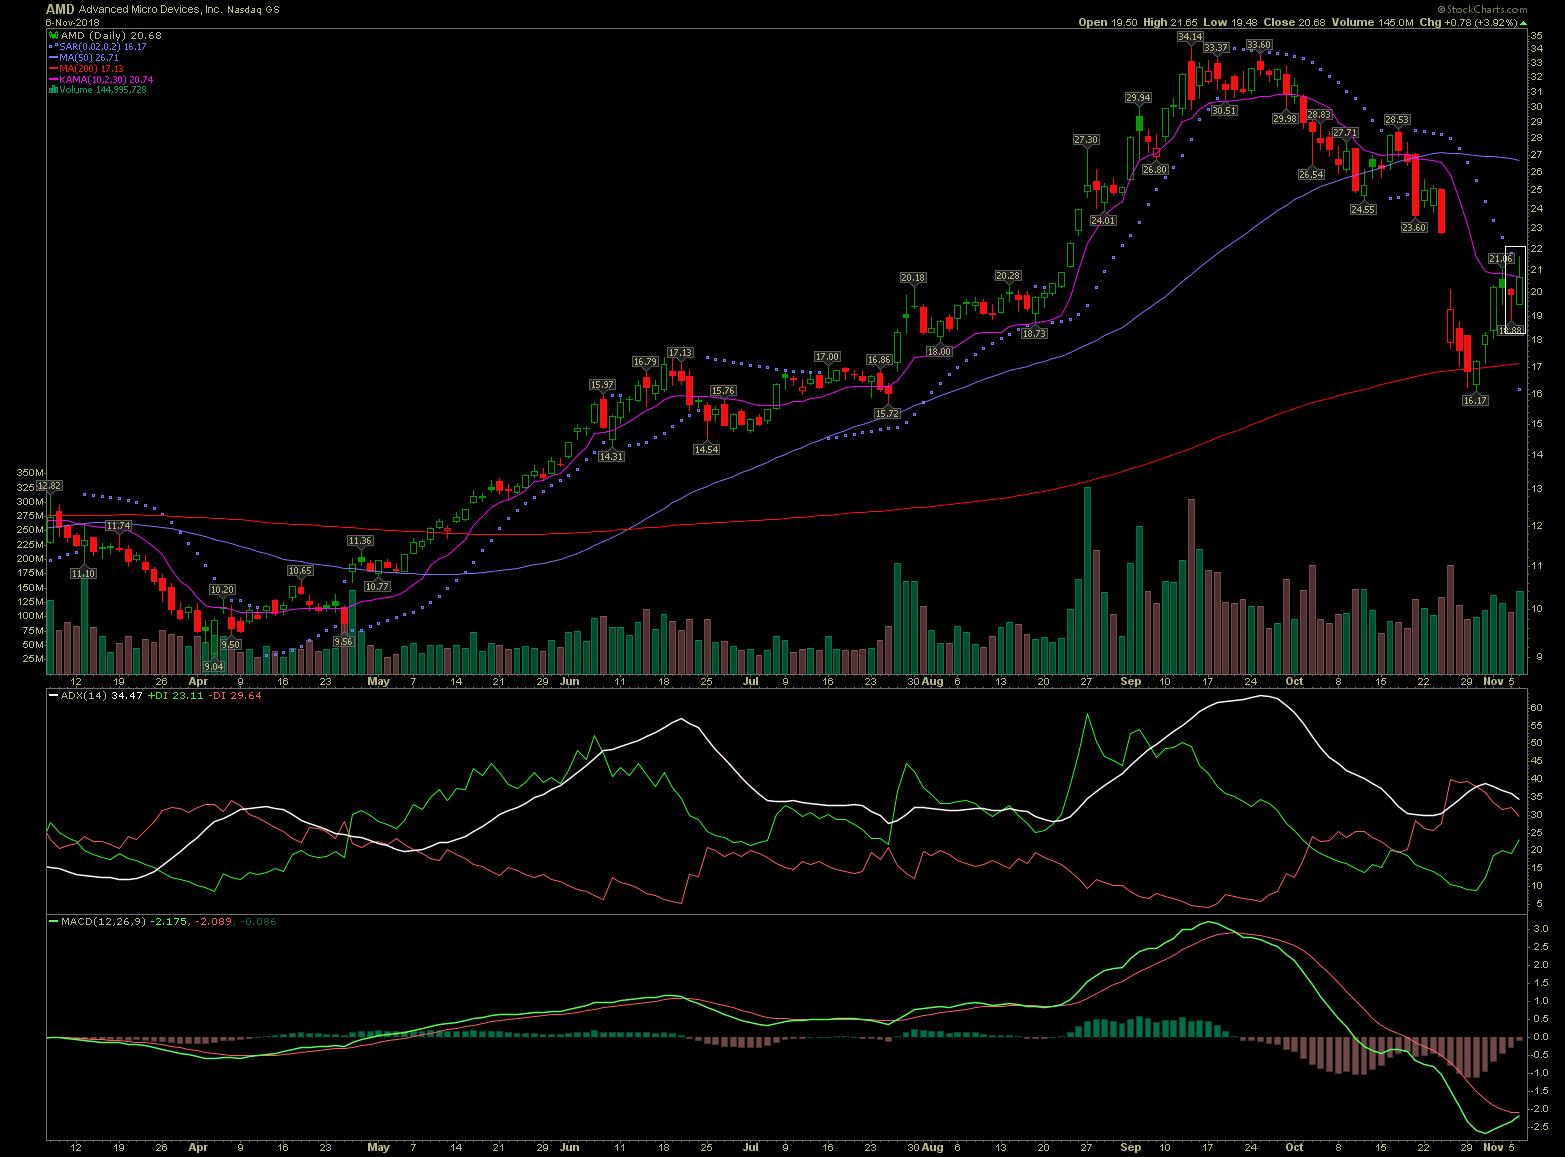 AMD stock chart with Bullish Engulfing candlestick